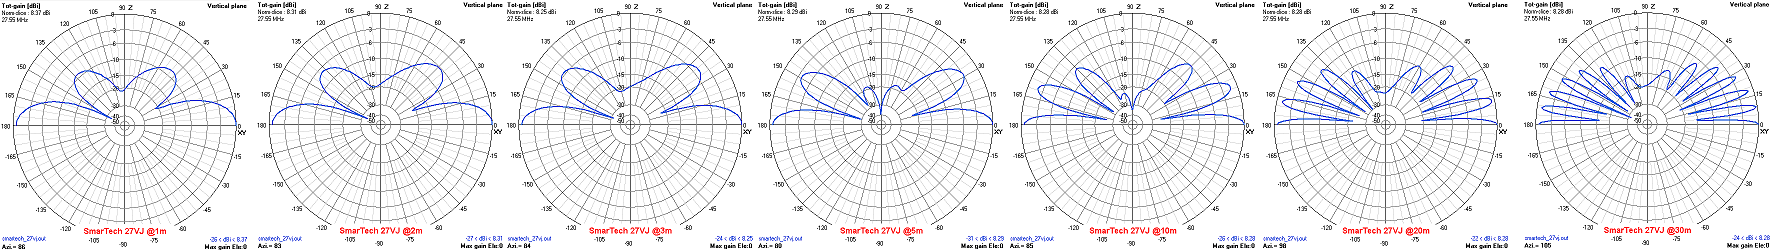 Vertical radiation pattern collection j-pole 27VJ SmarTech